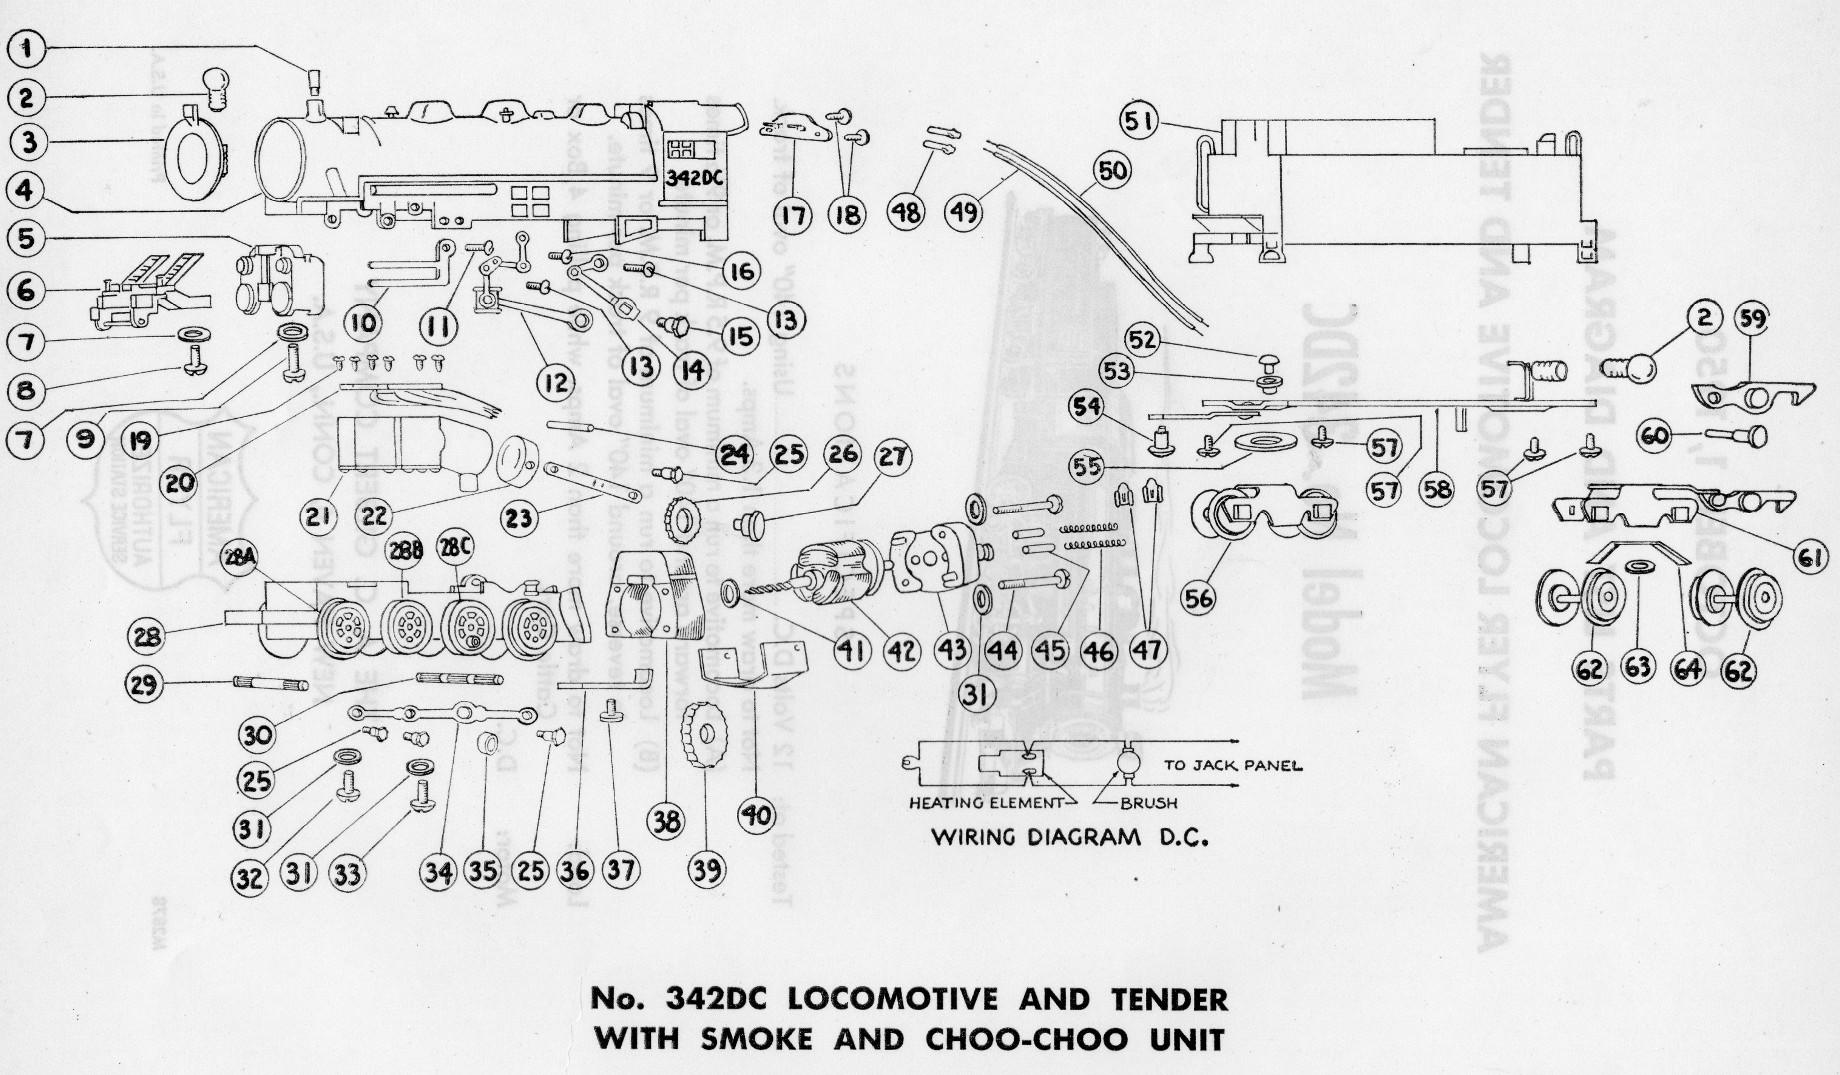 Bachmann Wiring Diagram Proto 2000 Wiring Diagram Wiring